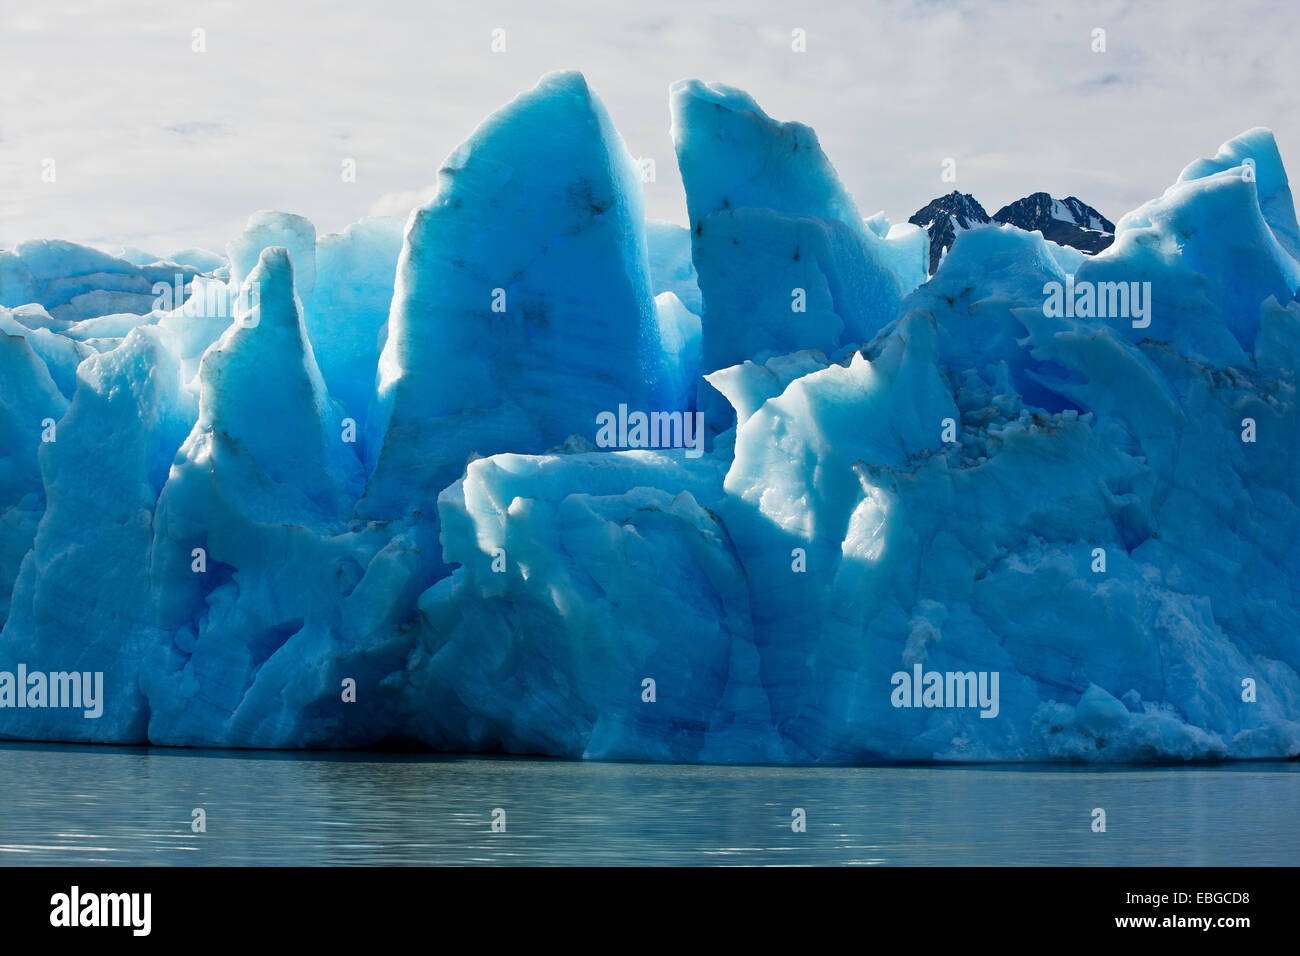 Grau-Gletscher, Eisfall, Gletscher Endstation, Torres del Paine Nationalpark, Chile Stockbild